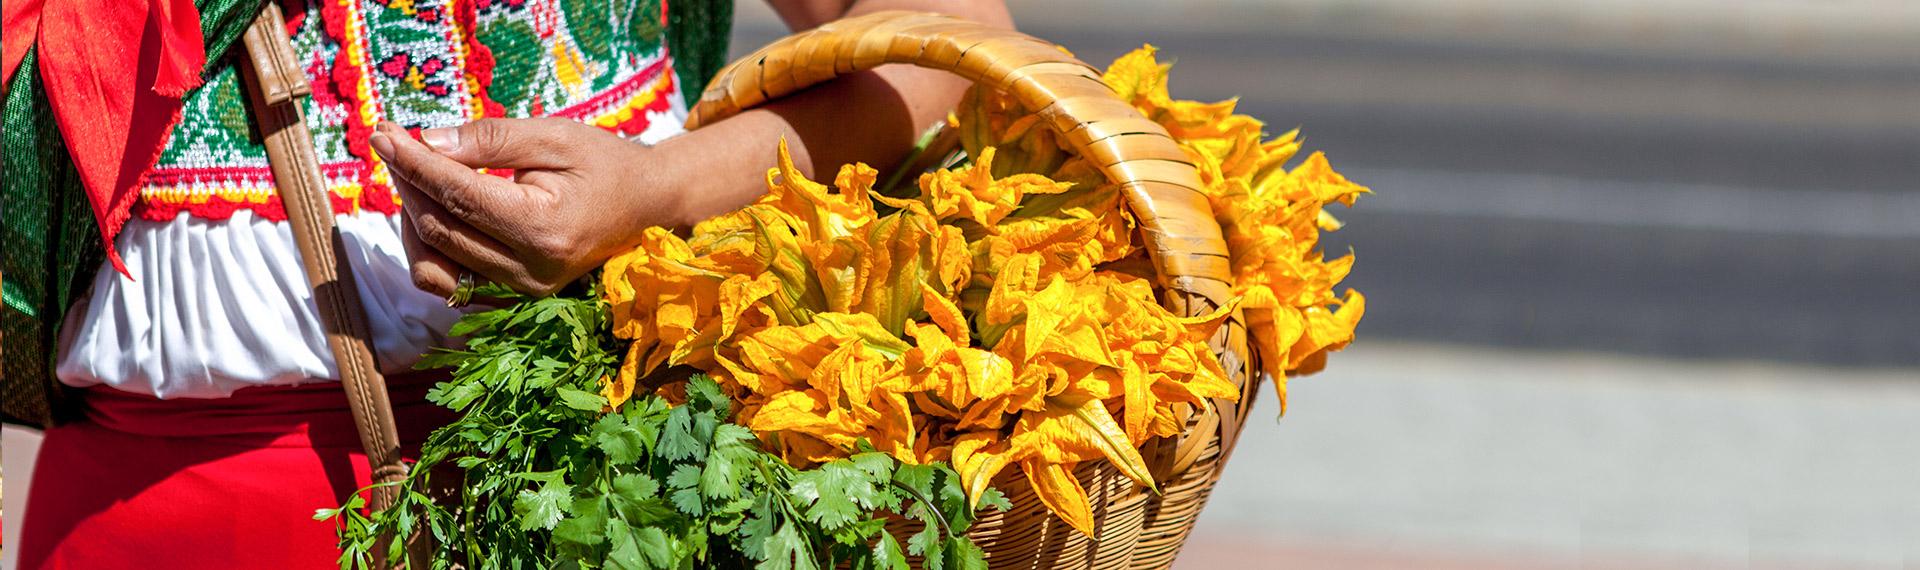 Typical Mexican celebration basket on Saint Patrick's Day